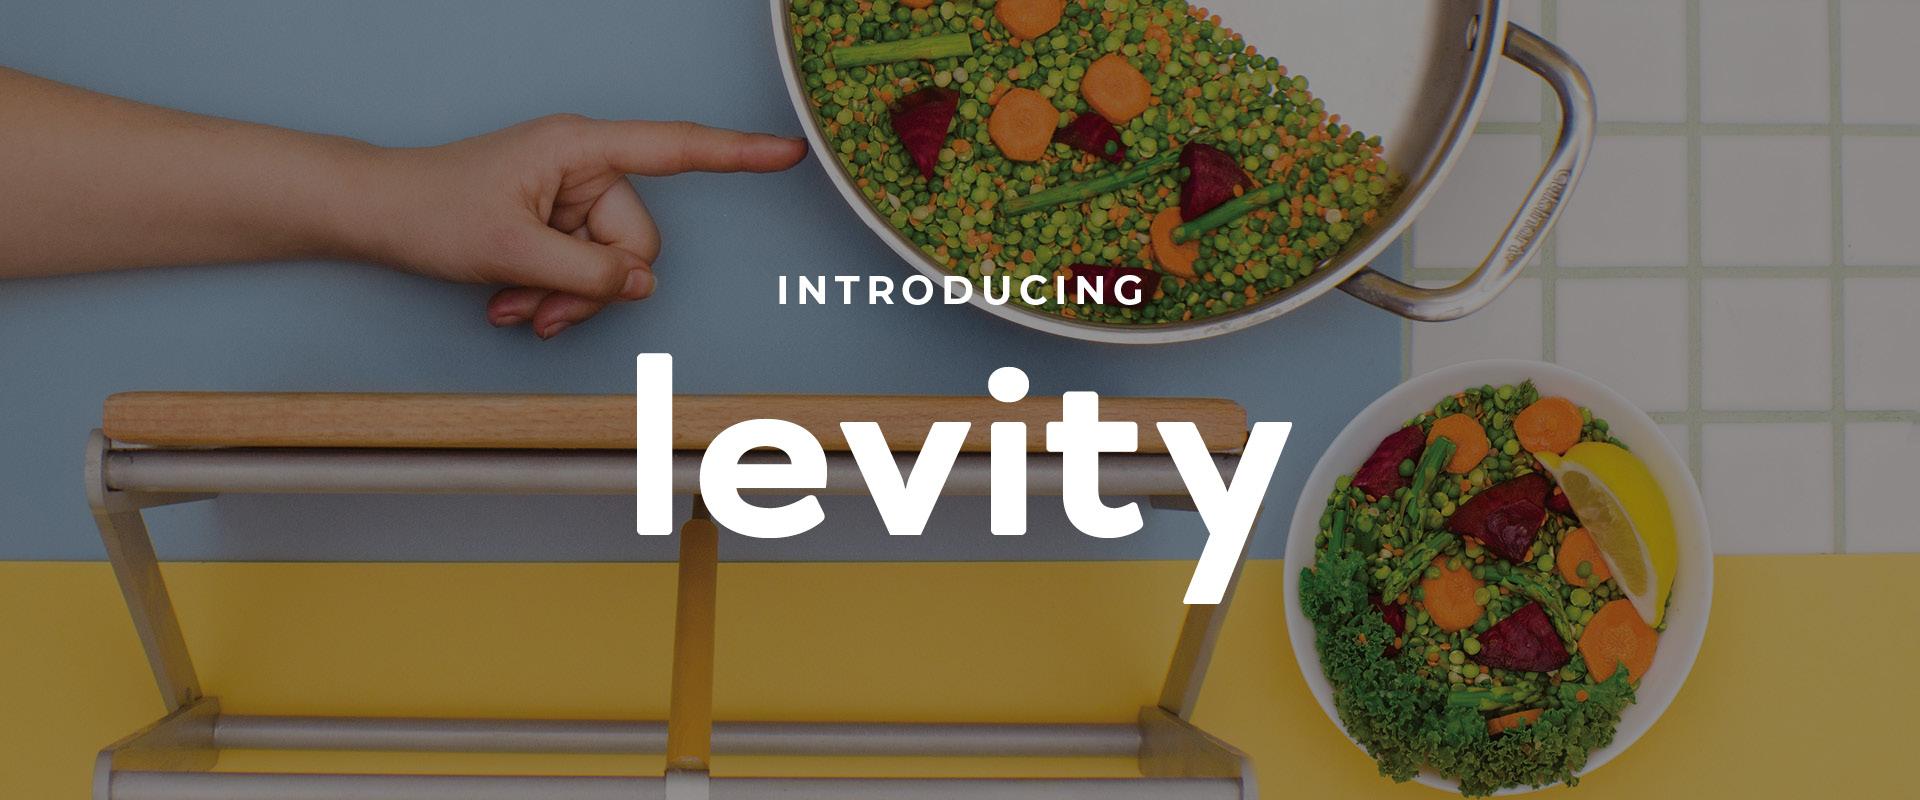 Introducing Levity.jpg